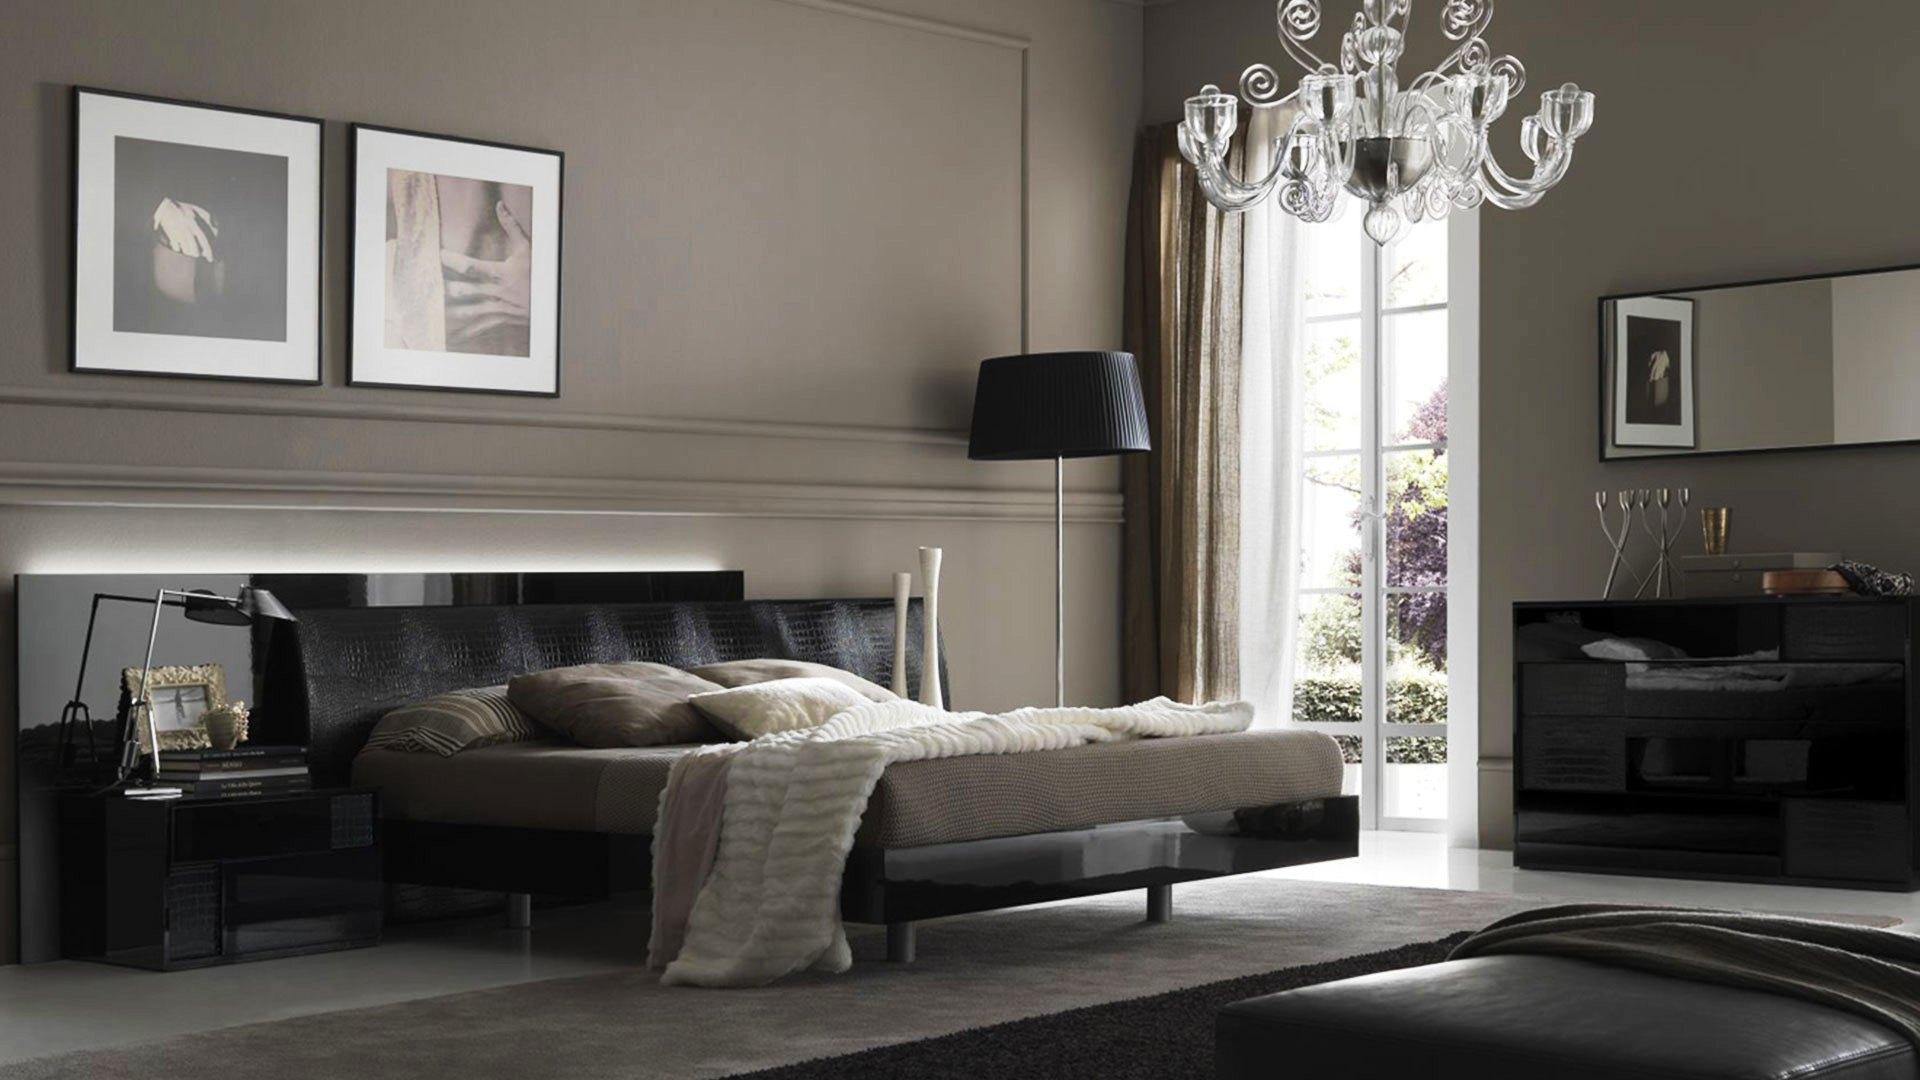 Him Bedroom Wallpaper Ideas Men Online Designer Gift Mens Decor Design 1920x1080